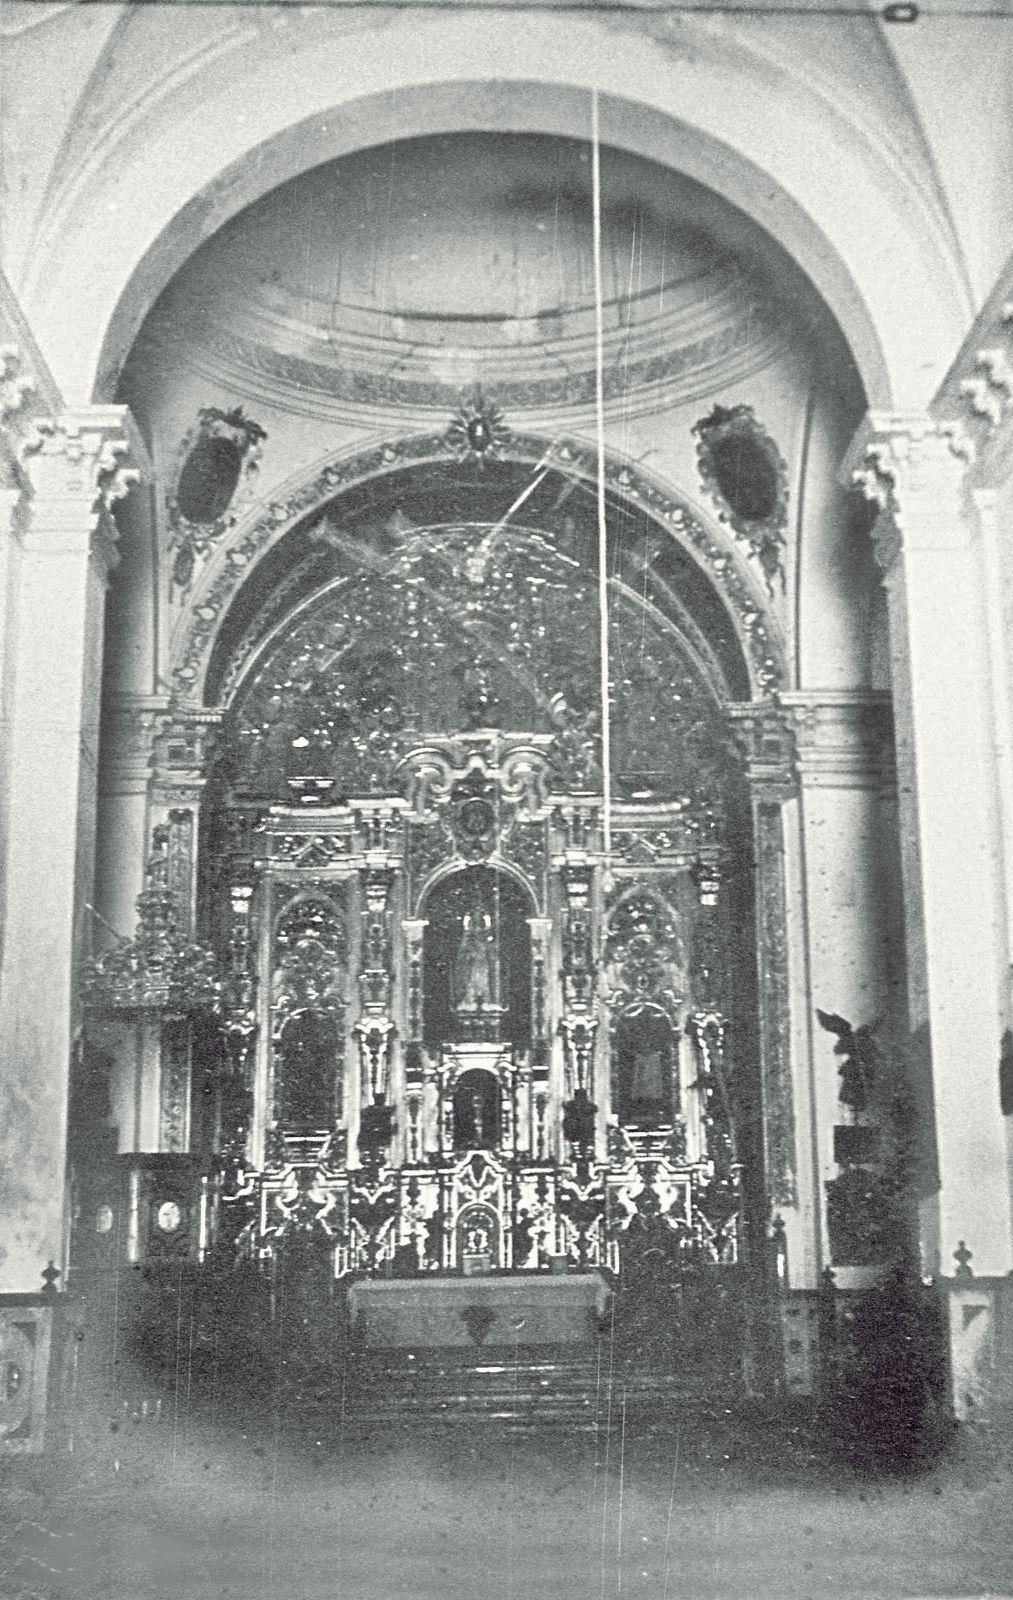 Interior De La Desaparecida Iglesia De La Victoria Estepa  # Muebles Leiva Sevilla